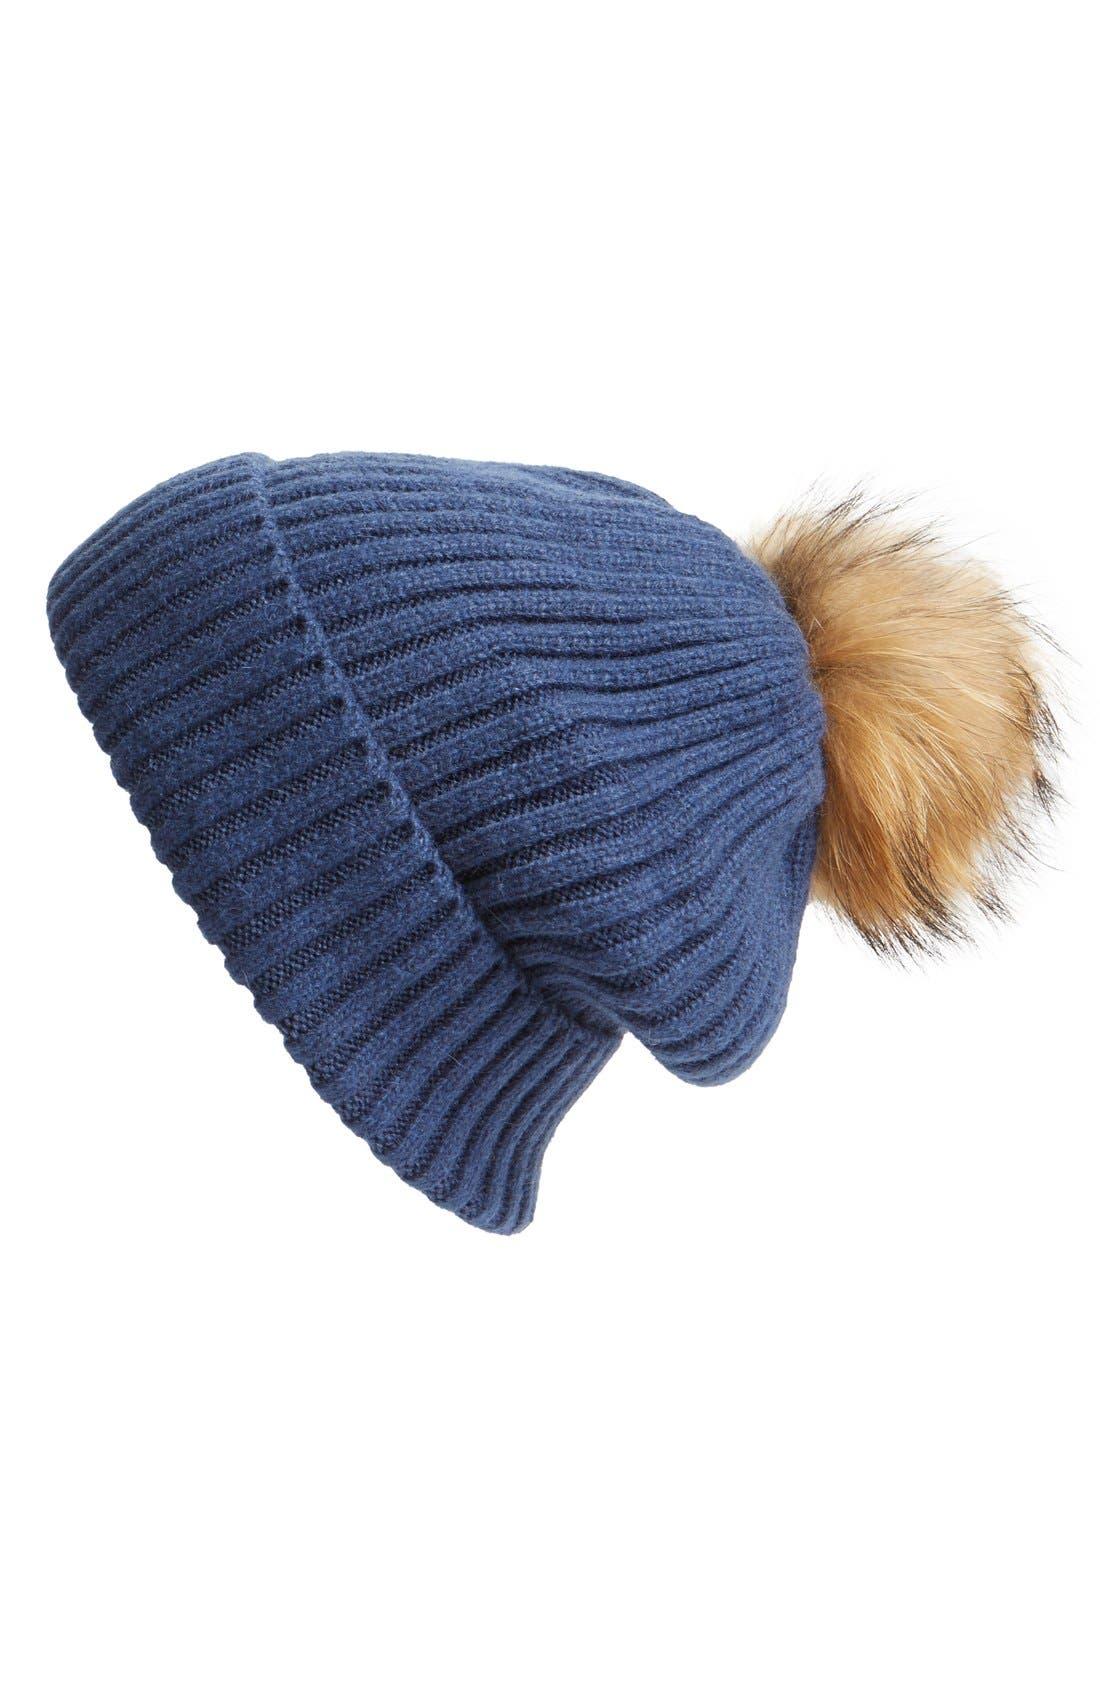 Alternate Image 1 Selected - Linda Richards Genuine Raccoon Fur Hat